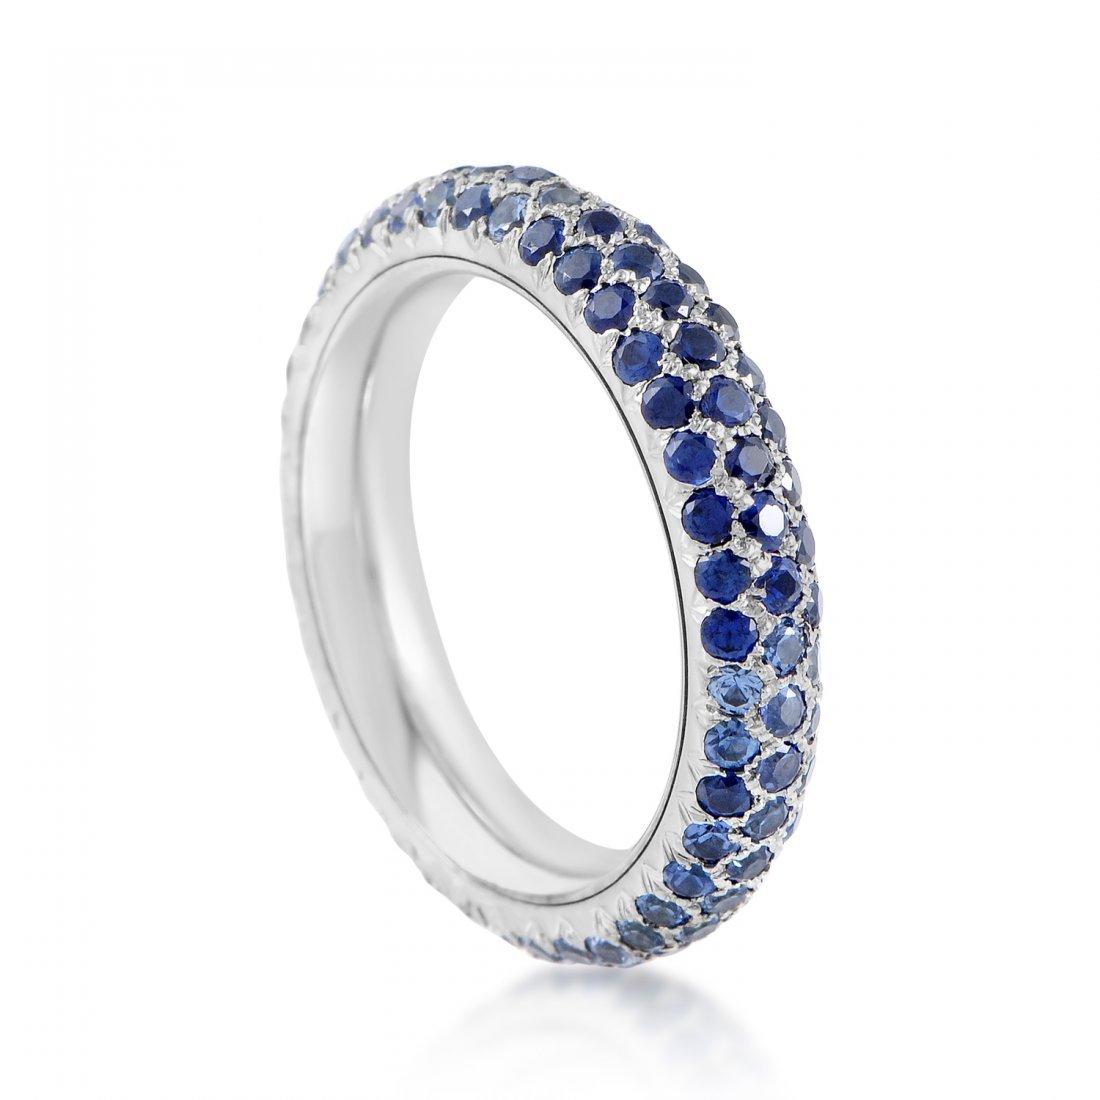 Chanel 18K White Gold Full Diamond & Sapphire Pave Band